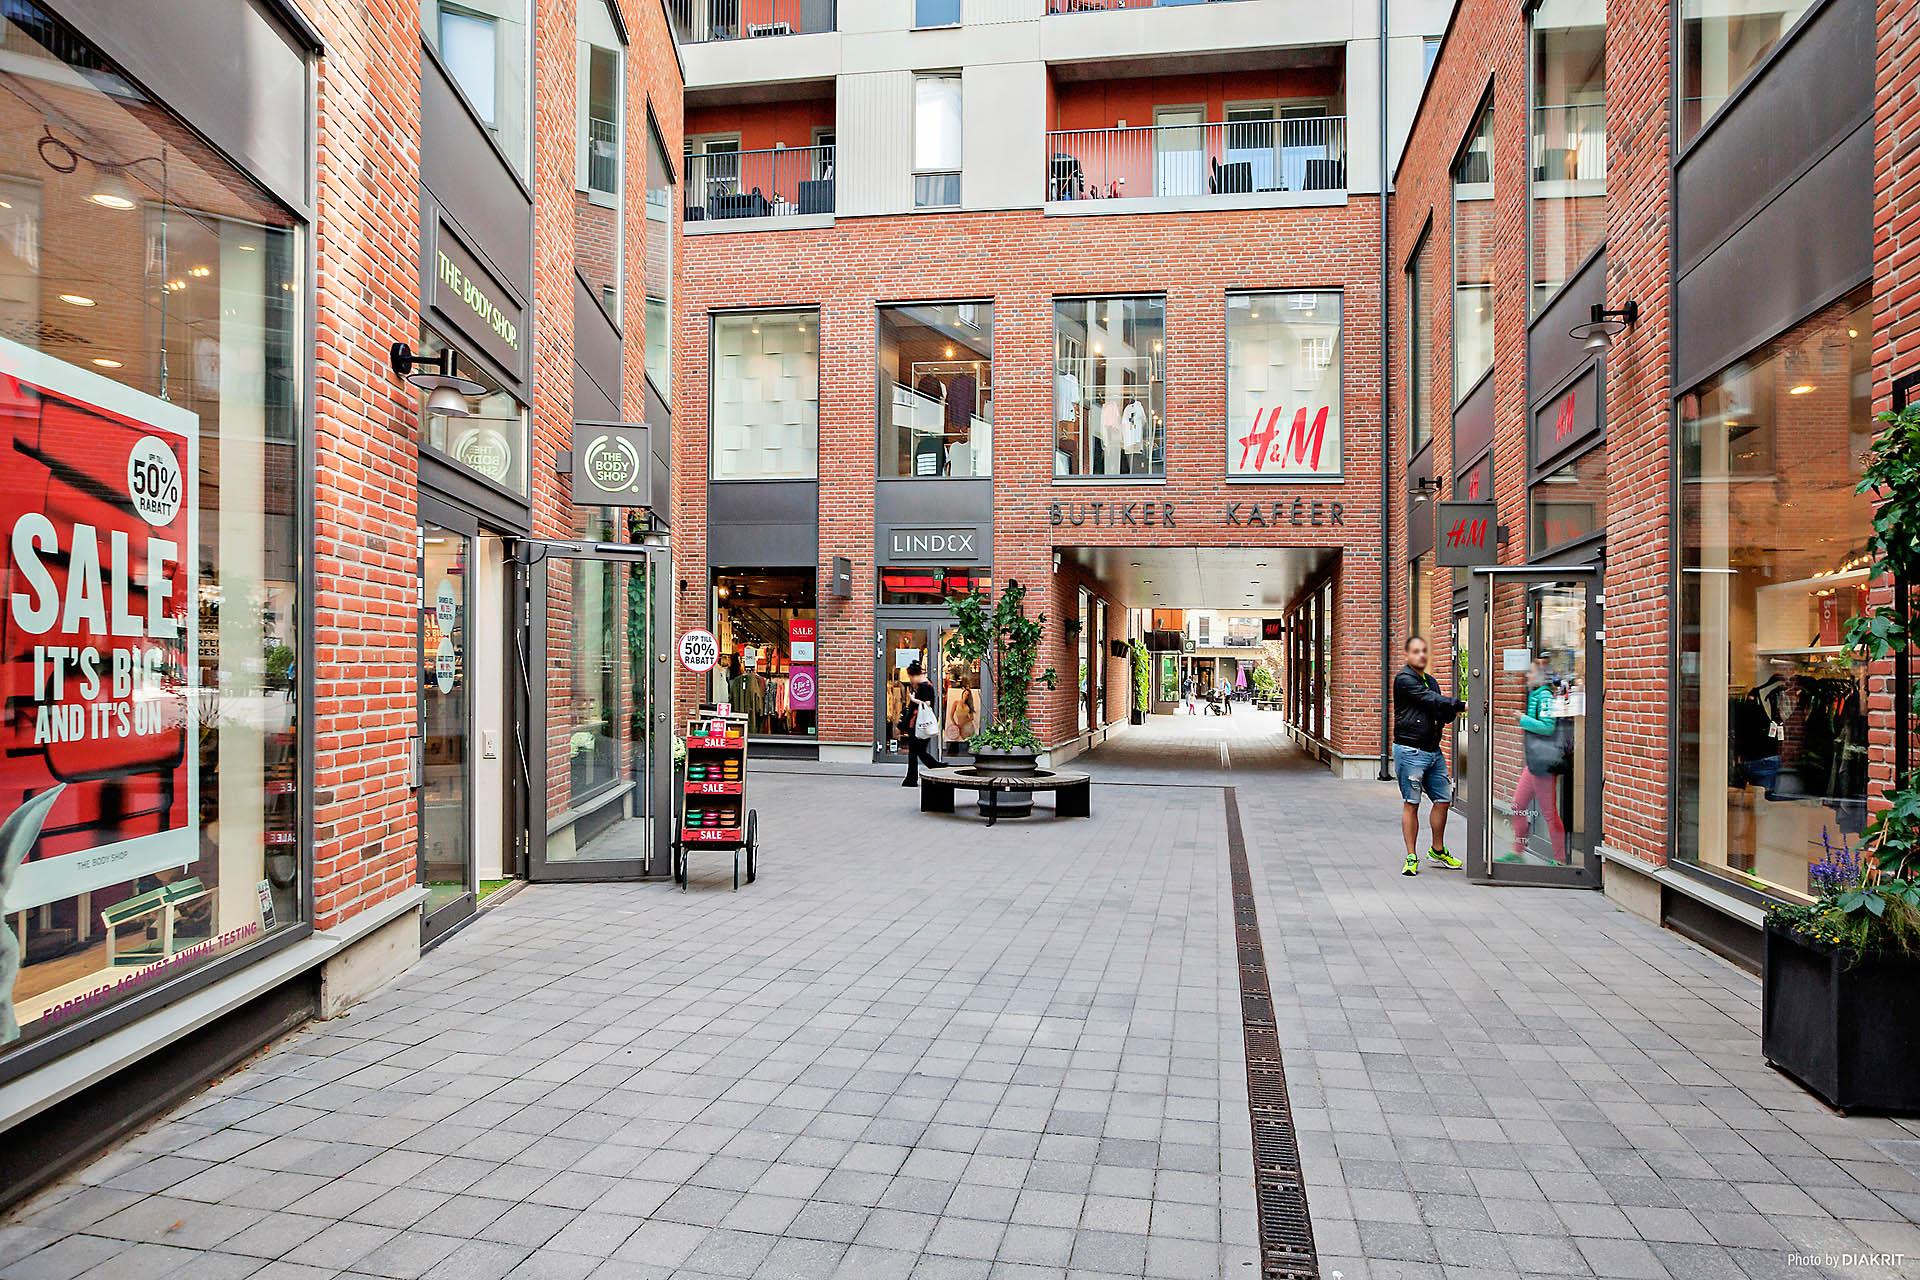 Shopping i Signal Fabriken Sundbybergs Centrum